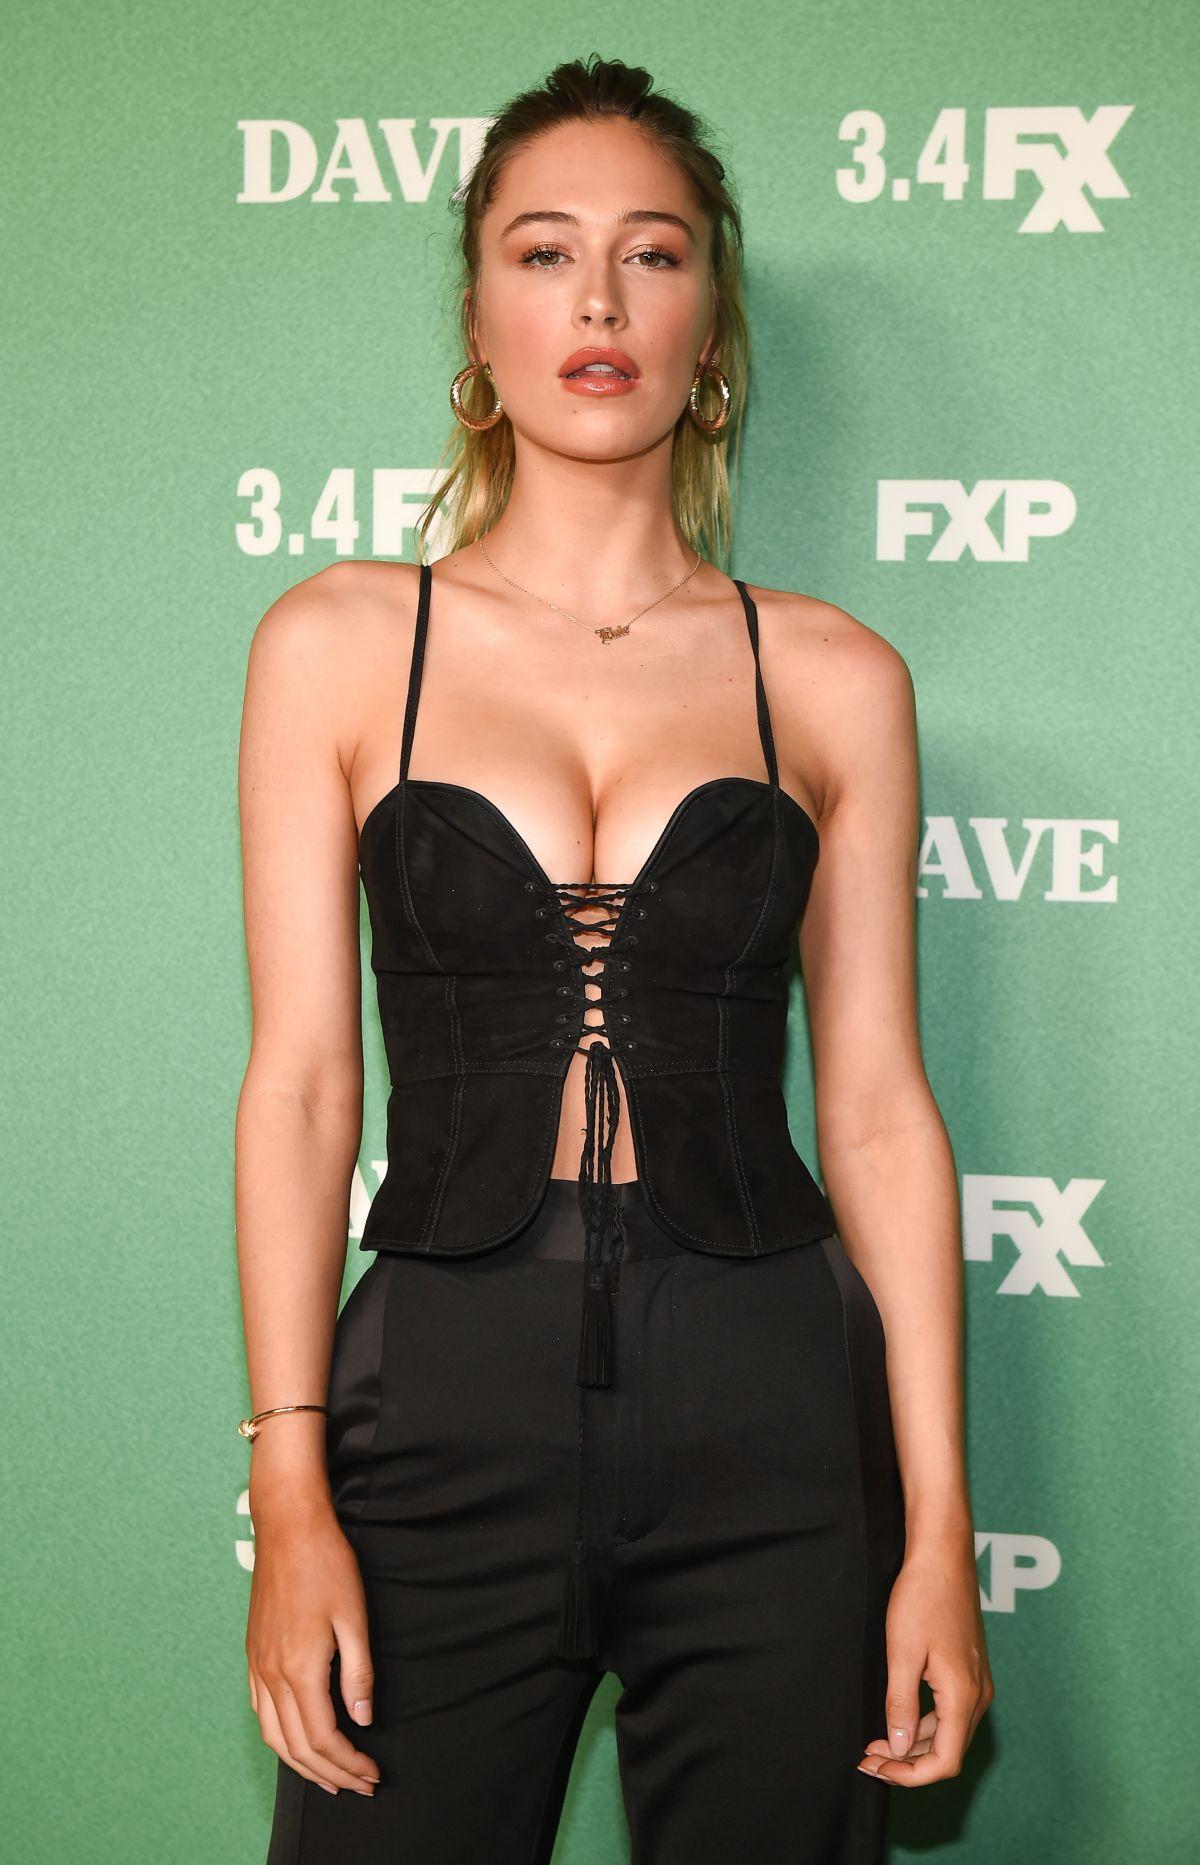 ELSIE HEWITT at Dave TV Show Premiere in Los Angeles 02/27